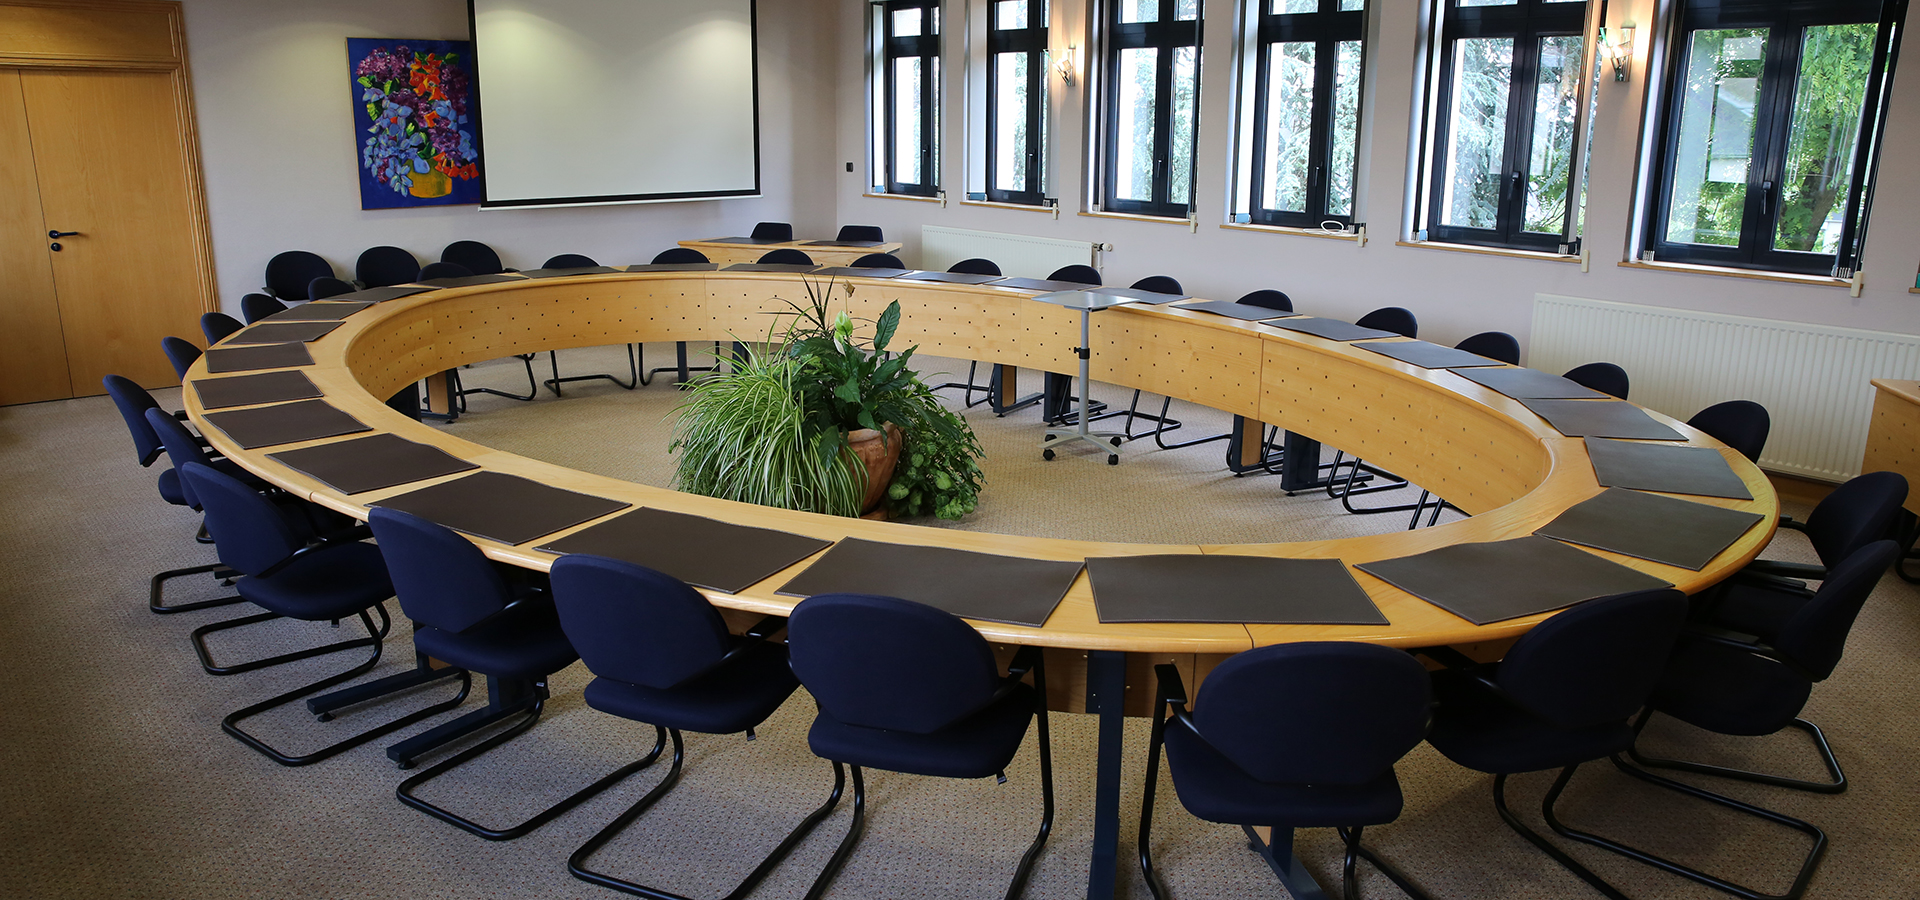 Salle des conseillers municipaux